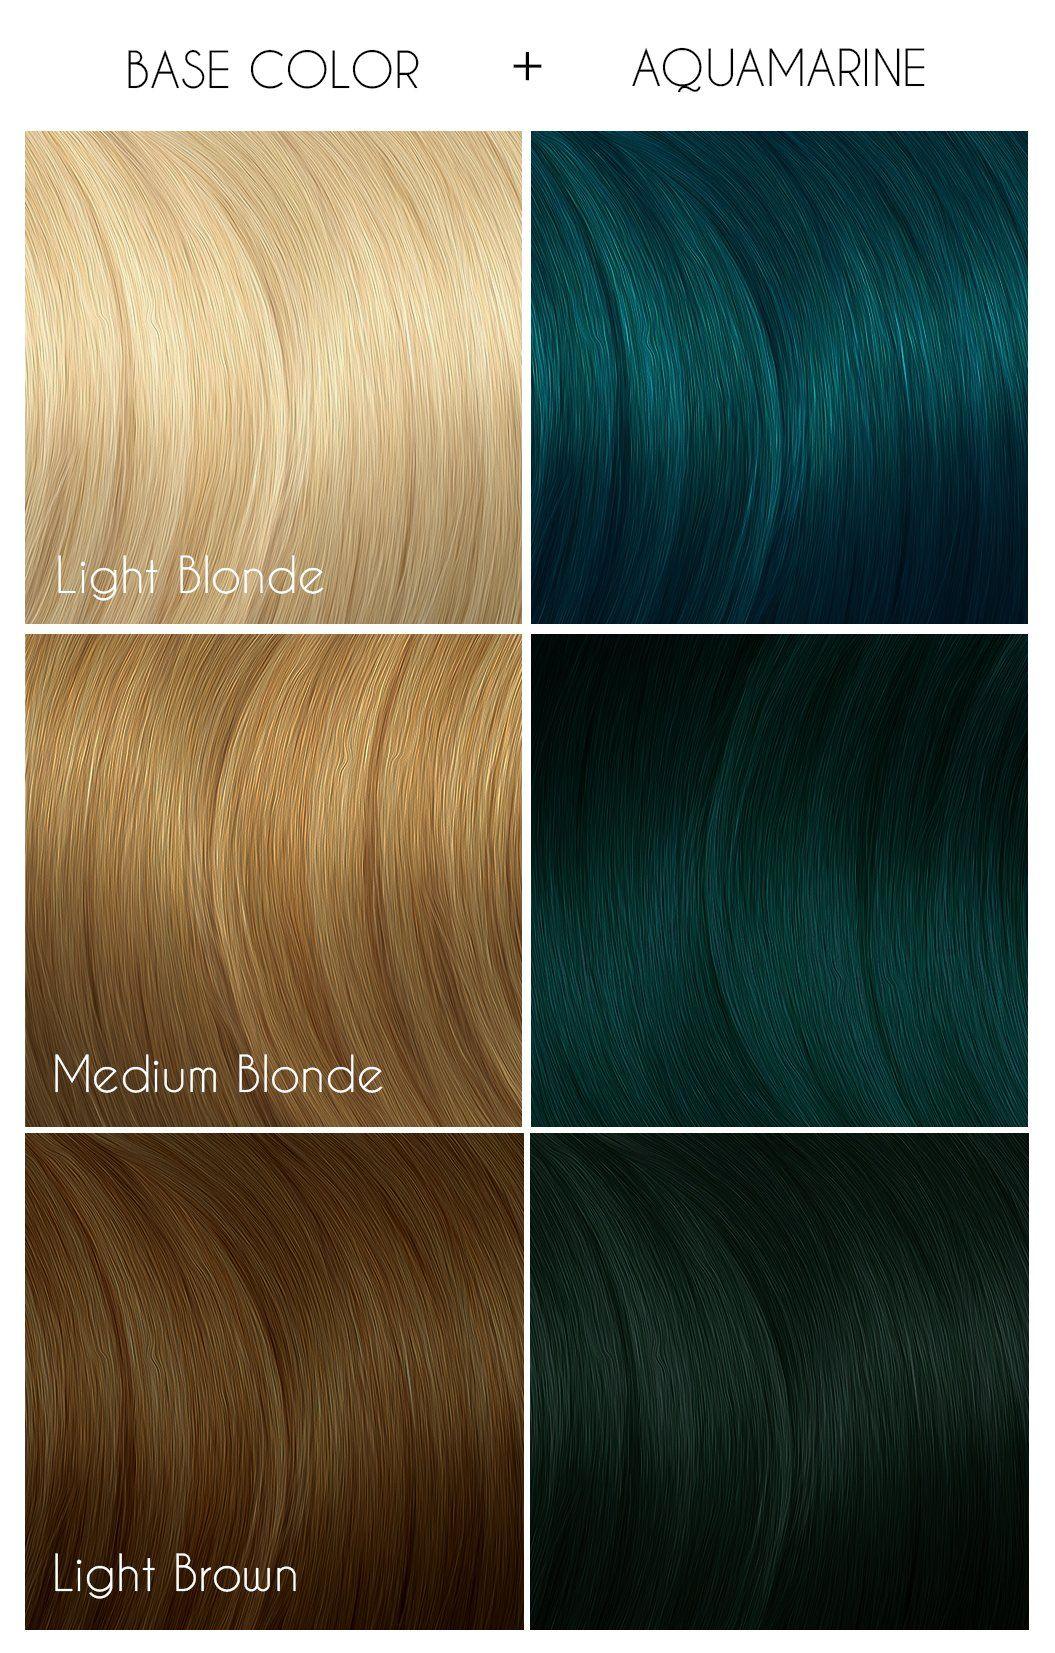 Aquamarine In 2020 Arctic Fox Hair Dye Arctic Fox Hair Color